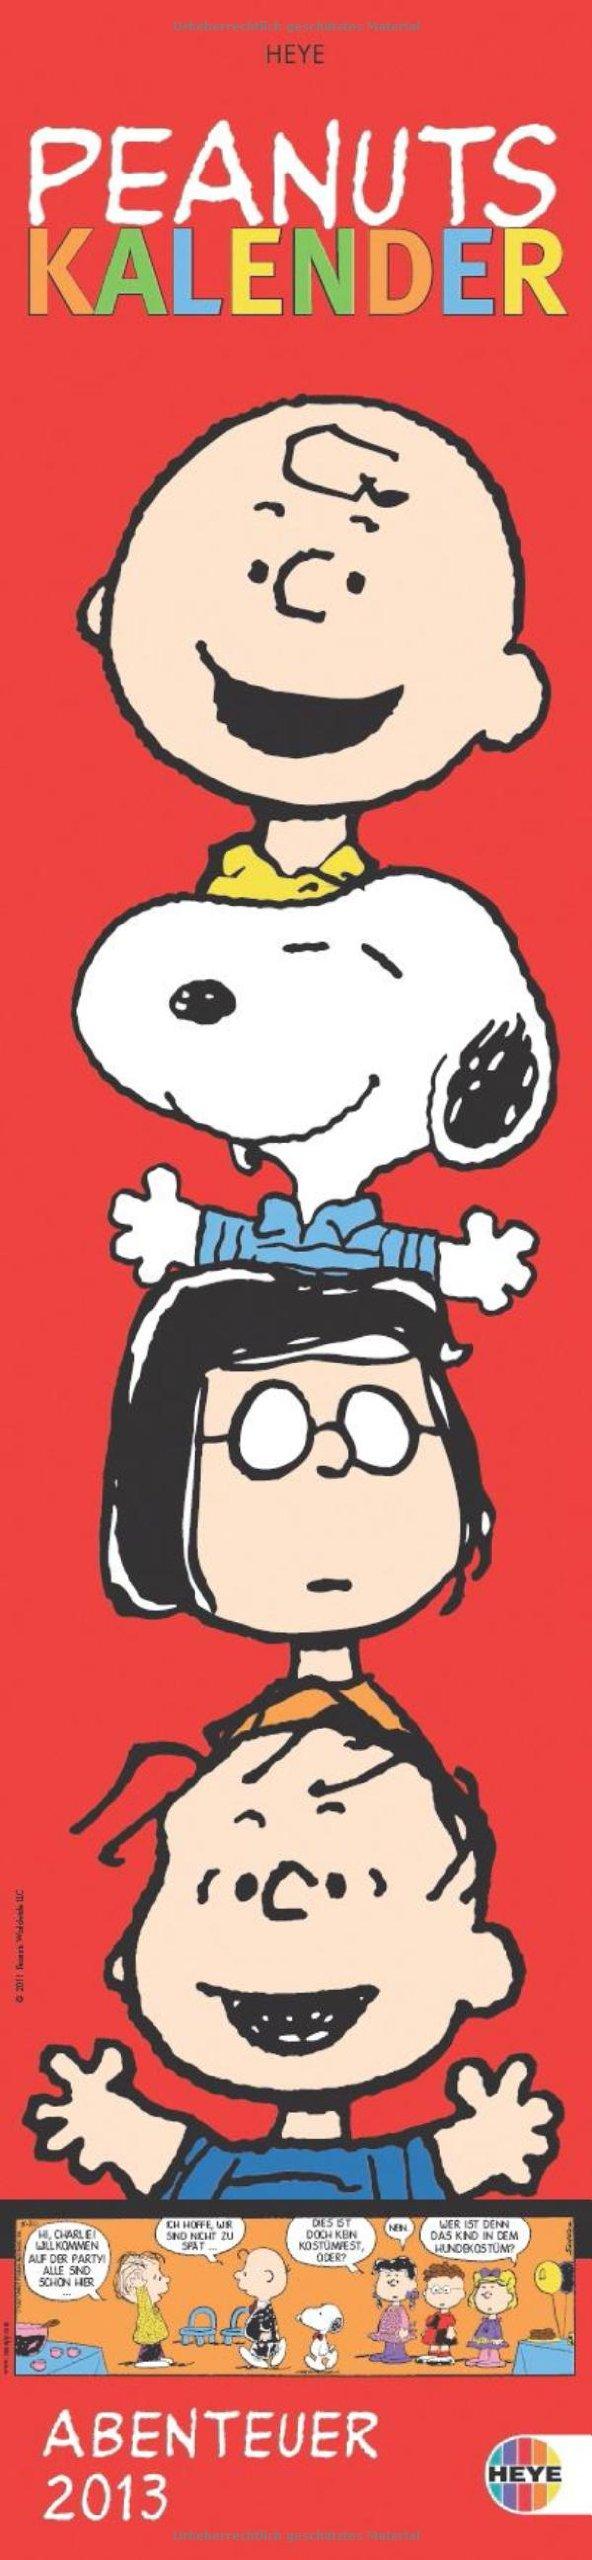 Peanuts Superlong 2013. Abenteuer